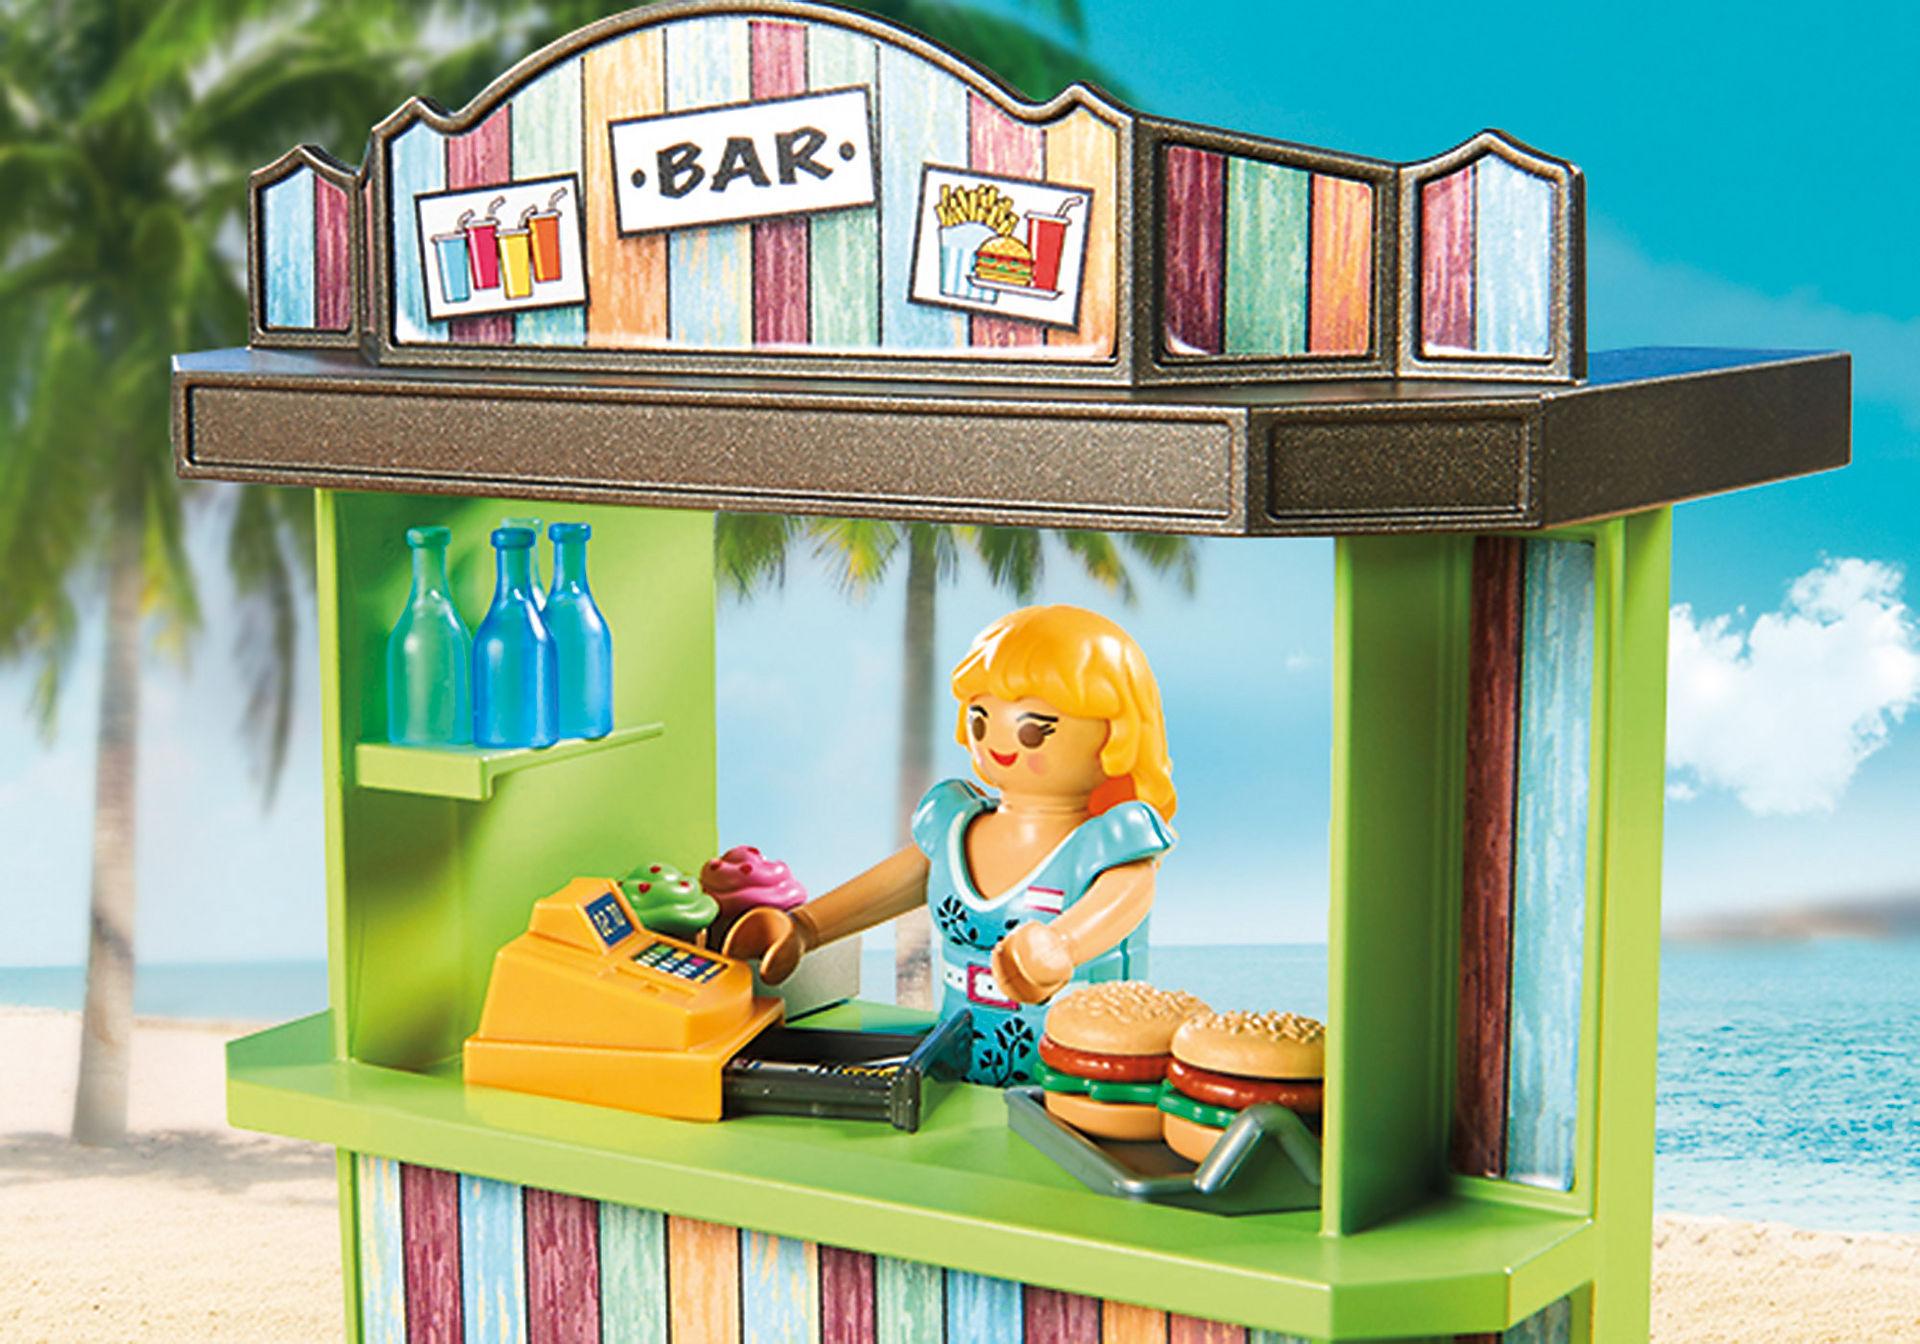 70437 Snack Bar zoom image4